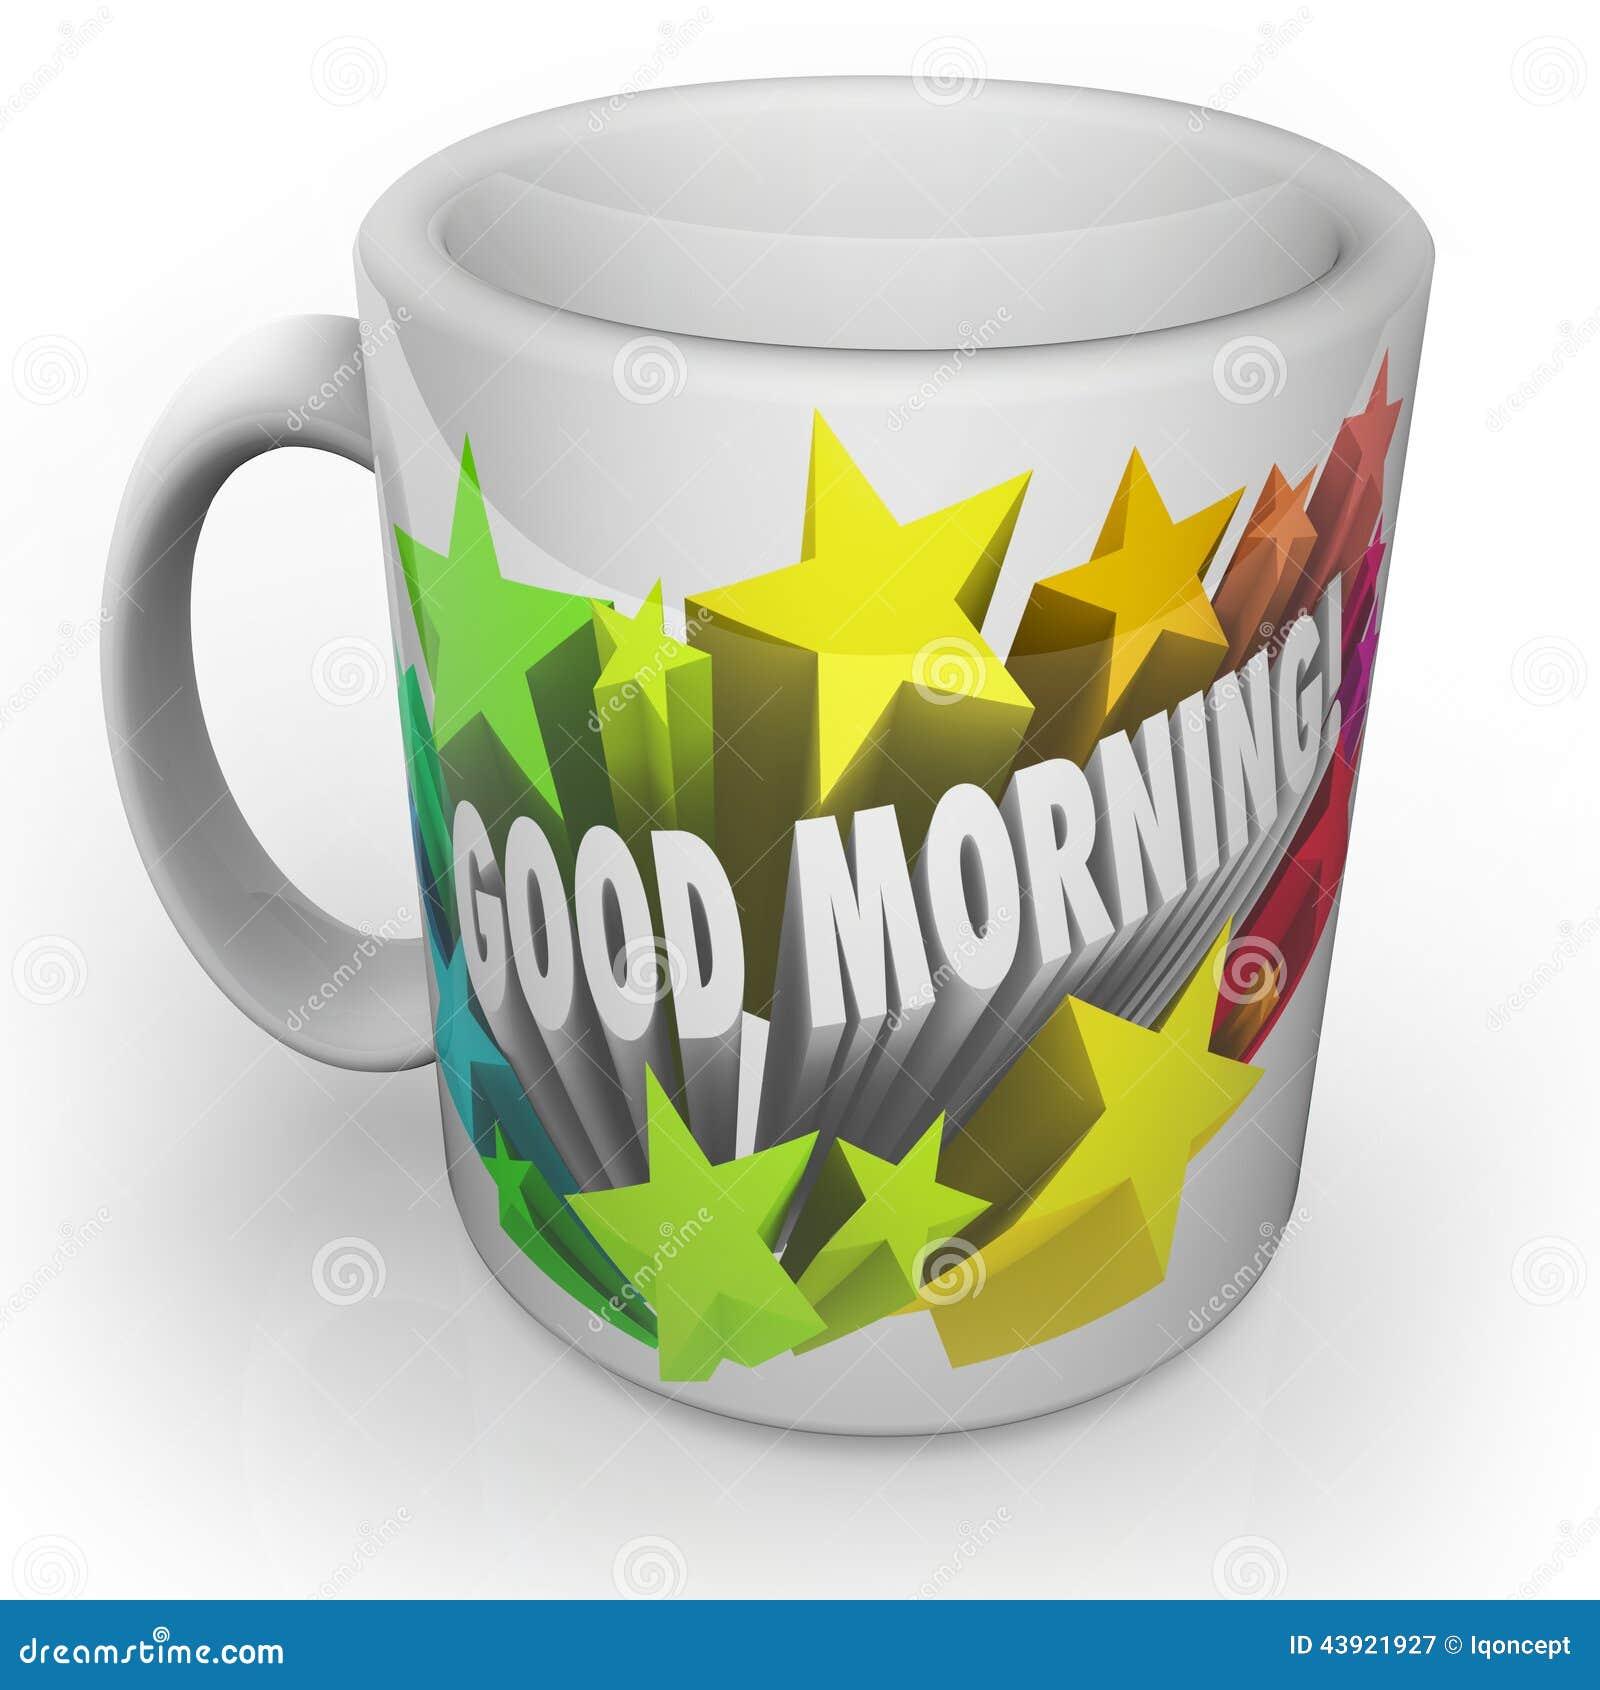 Good Morning One Word Or Two : Good morning coffee mug start new day fresh stock